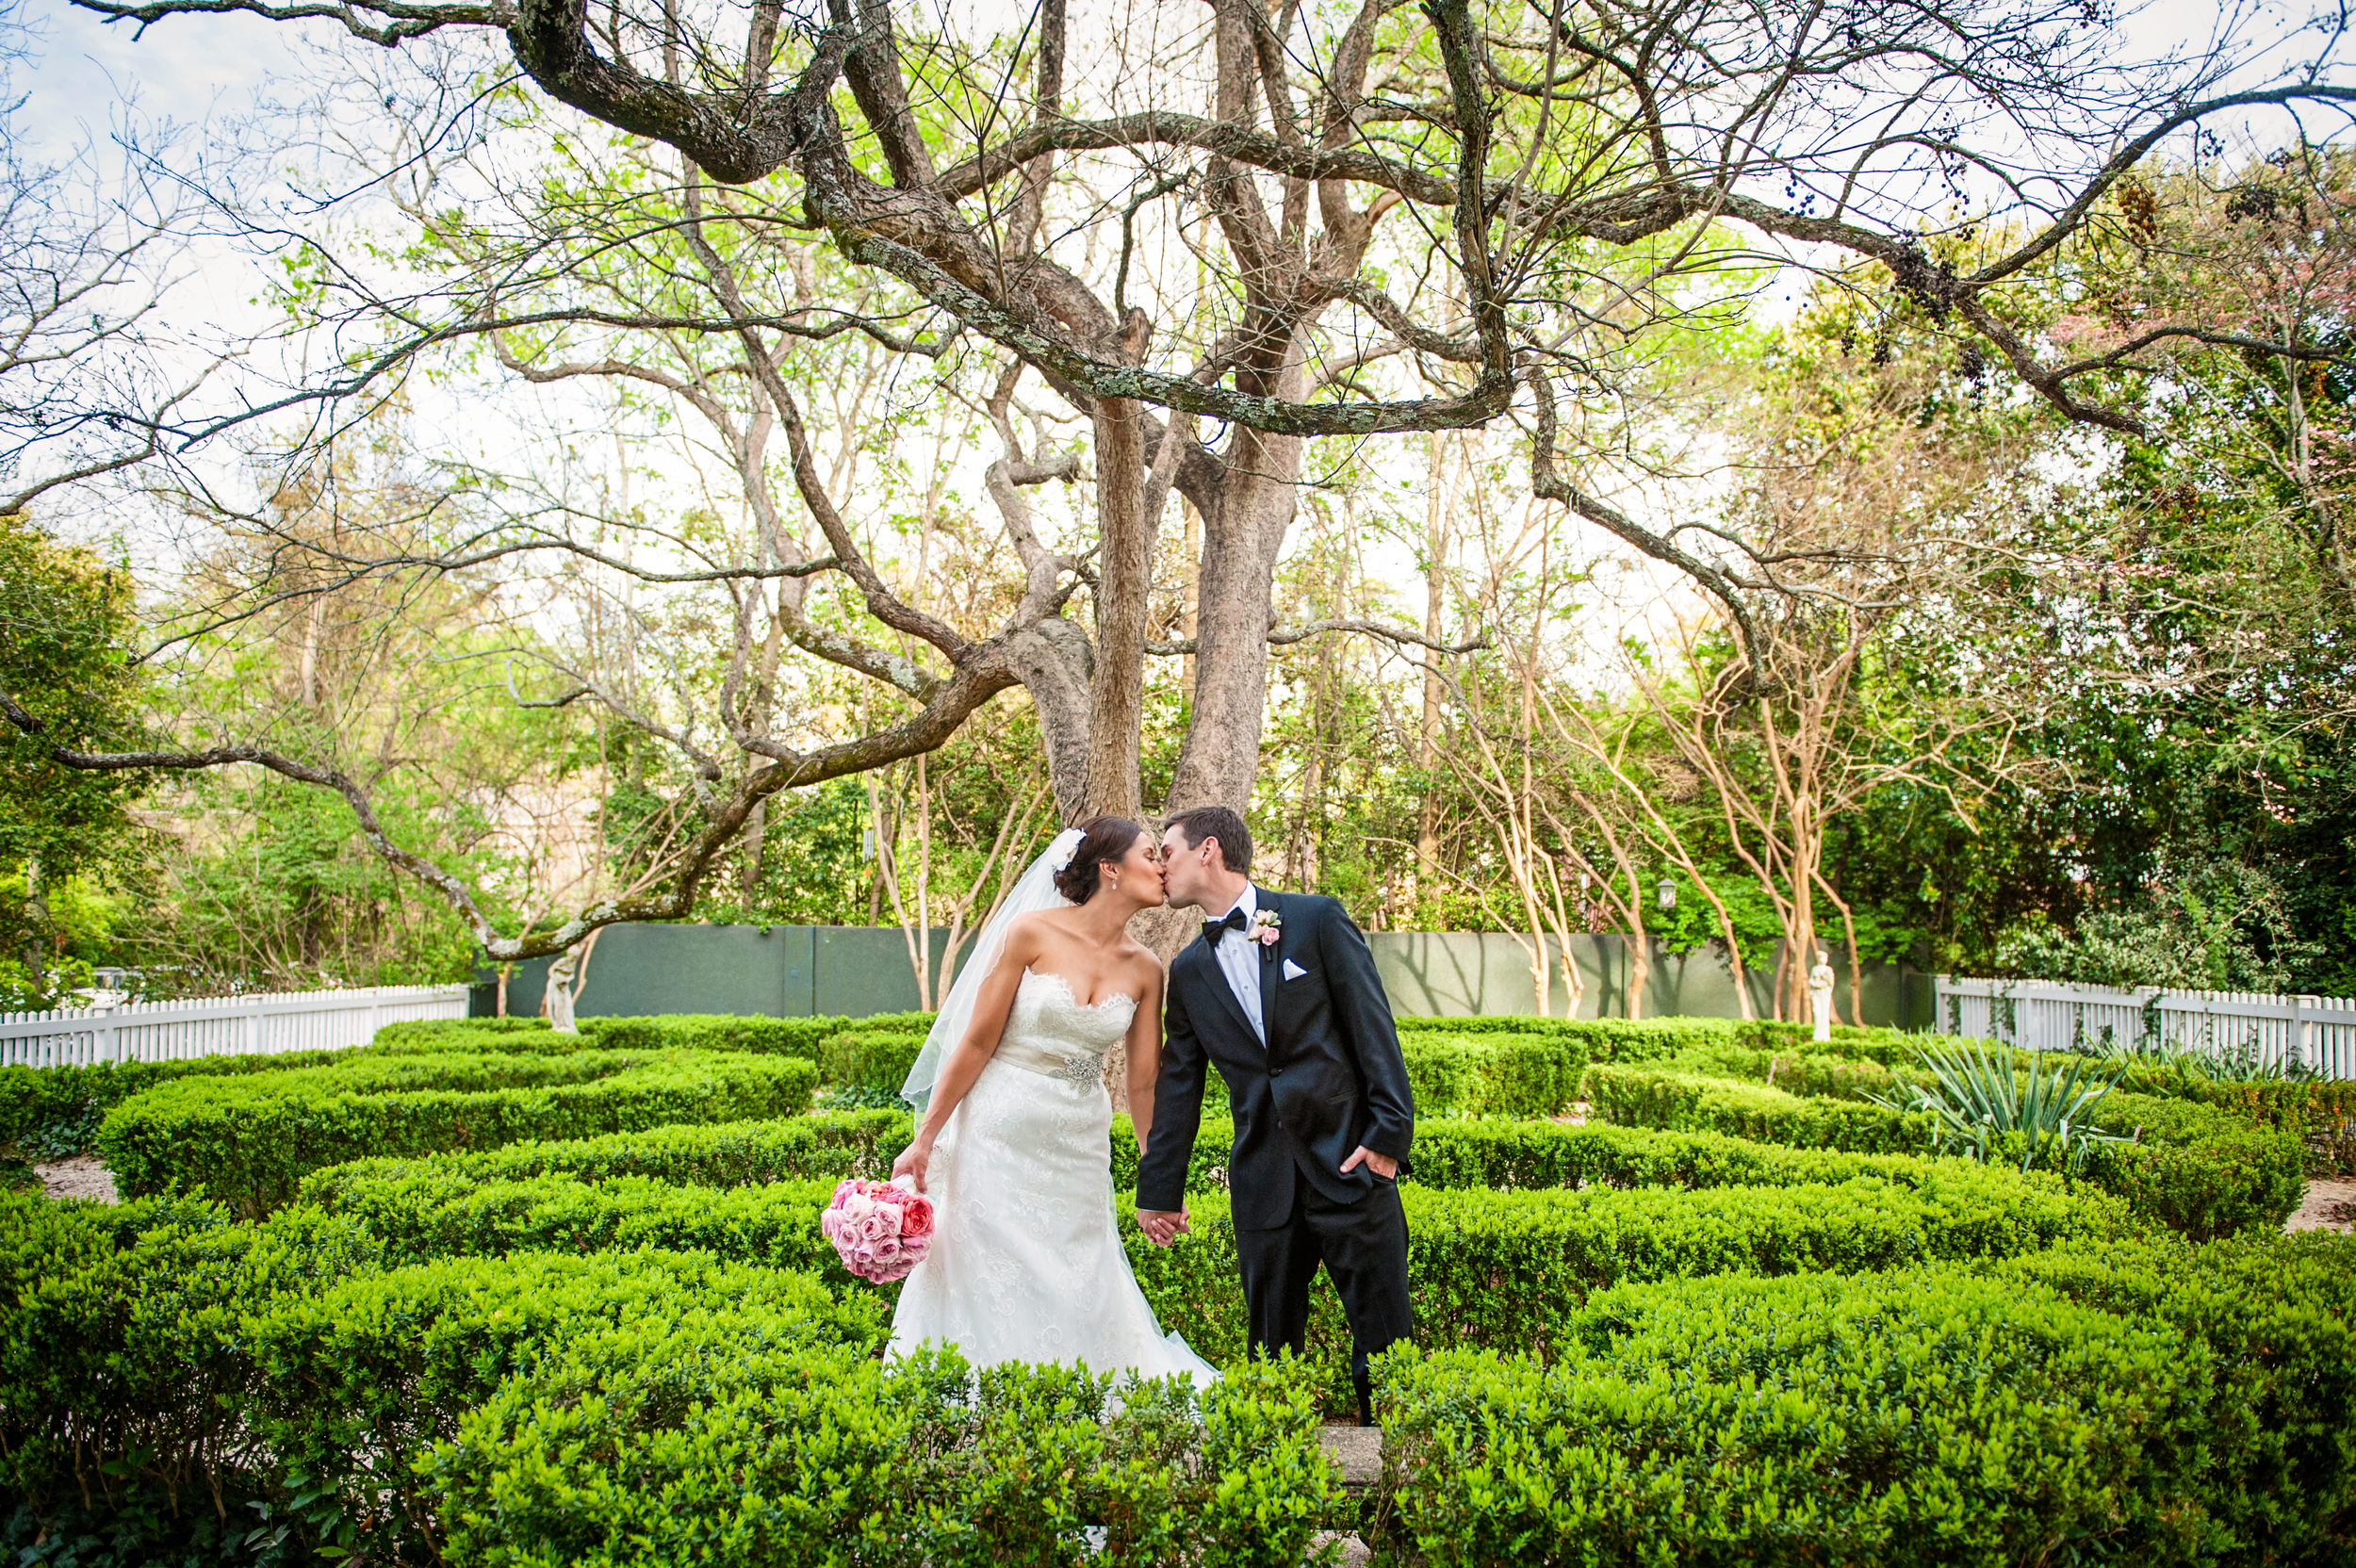 Kanavage_Wedding-45.jpg